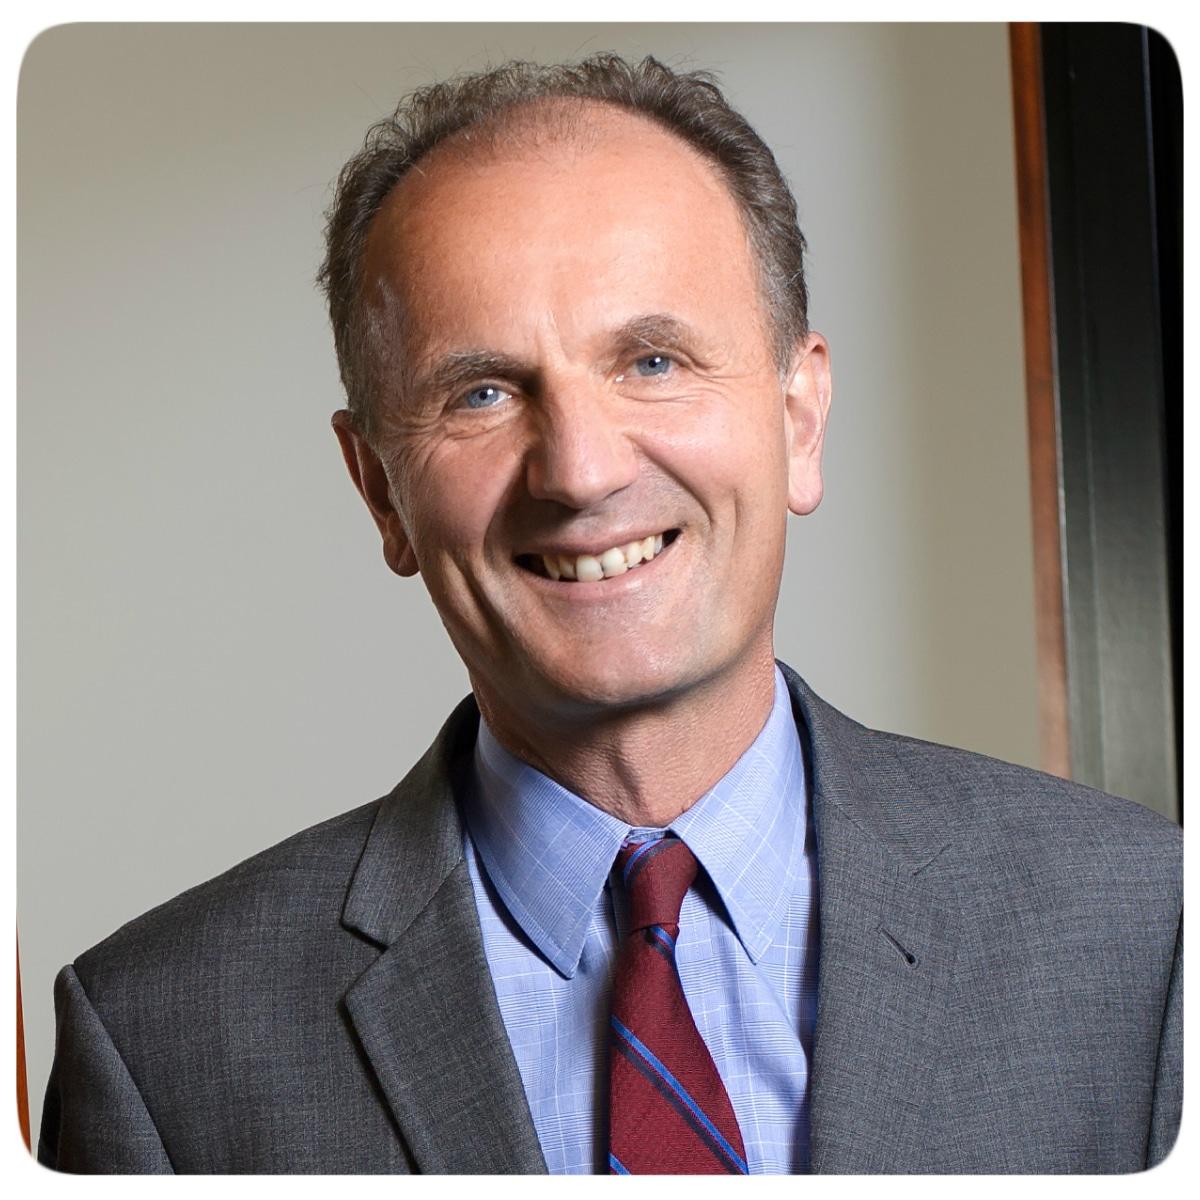 Peter D. Lowe